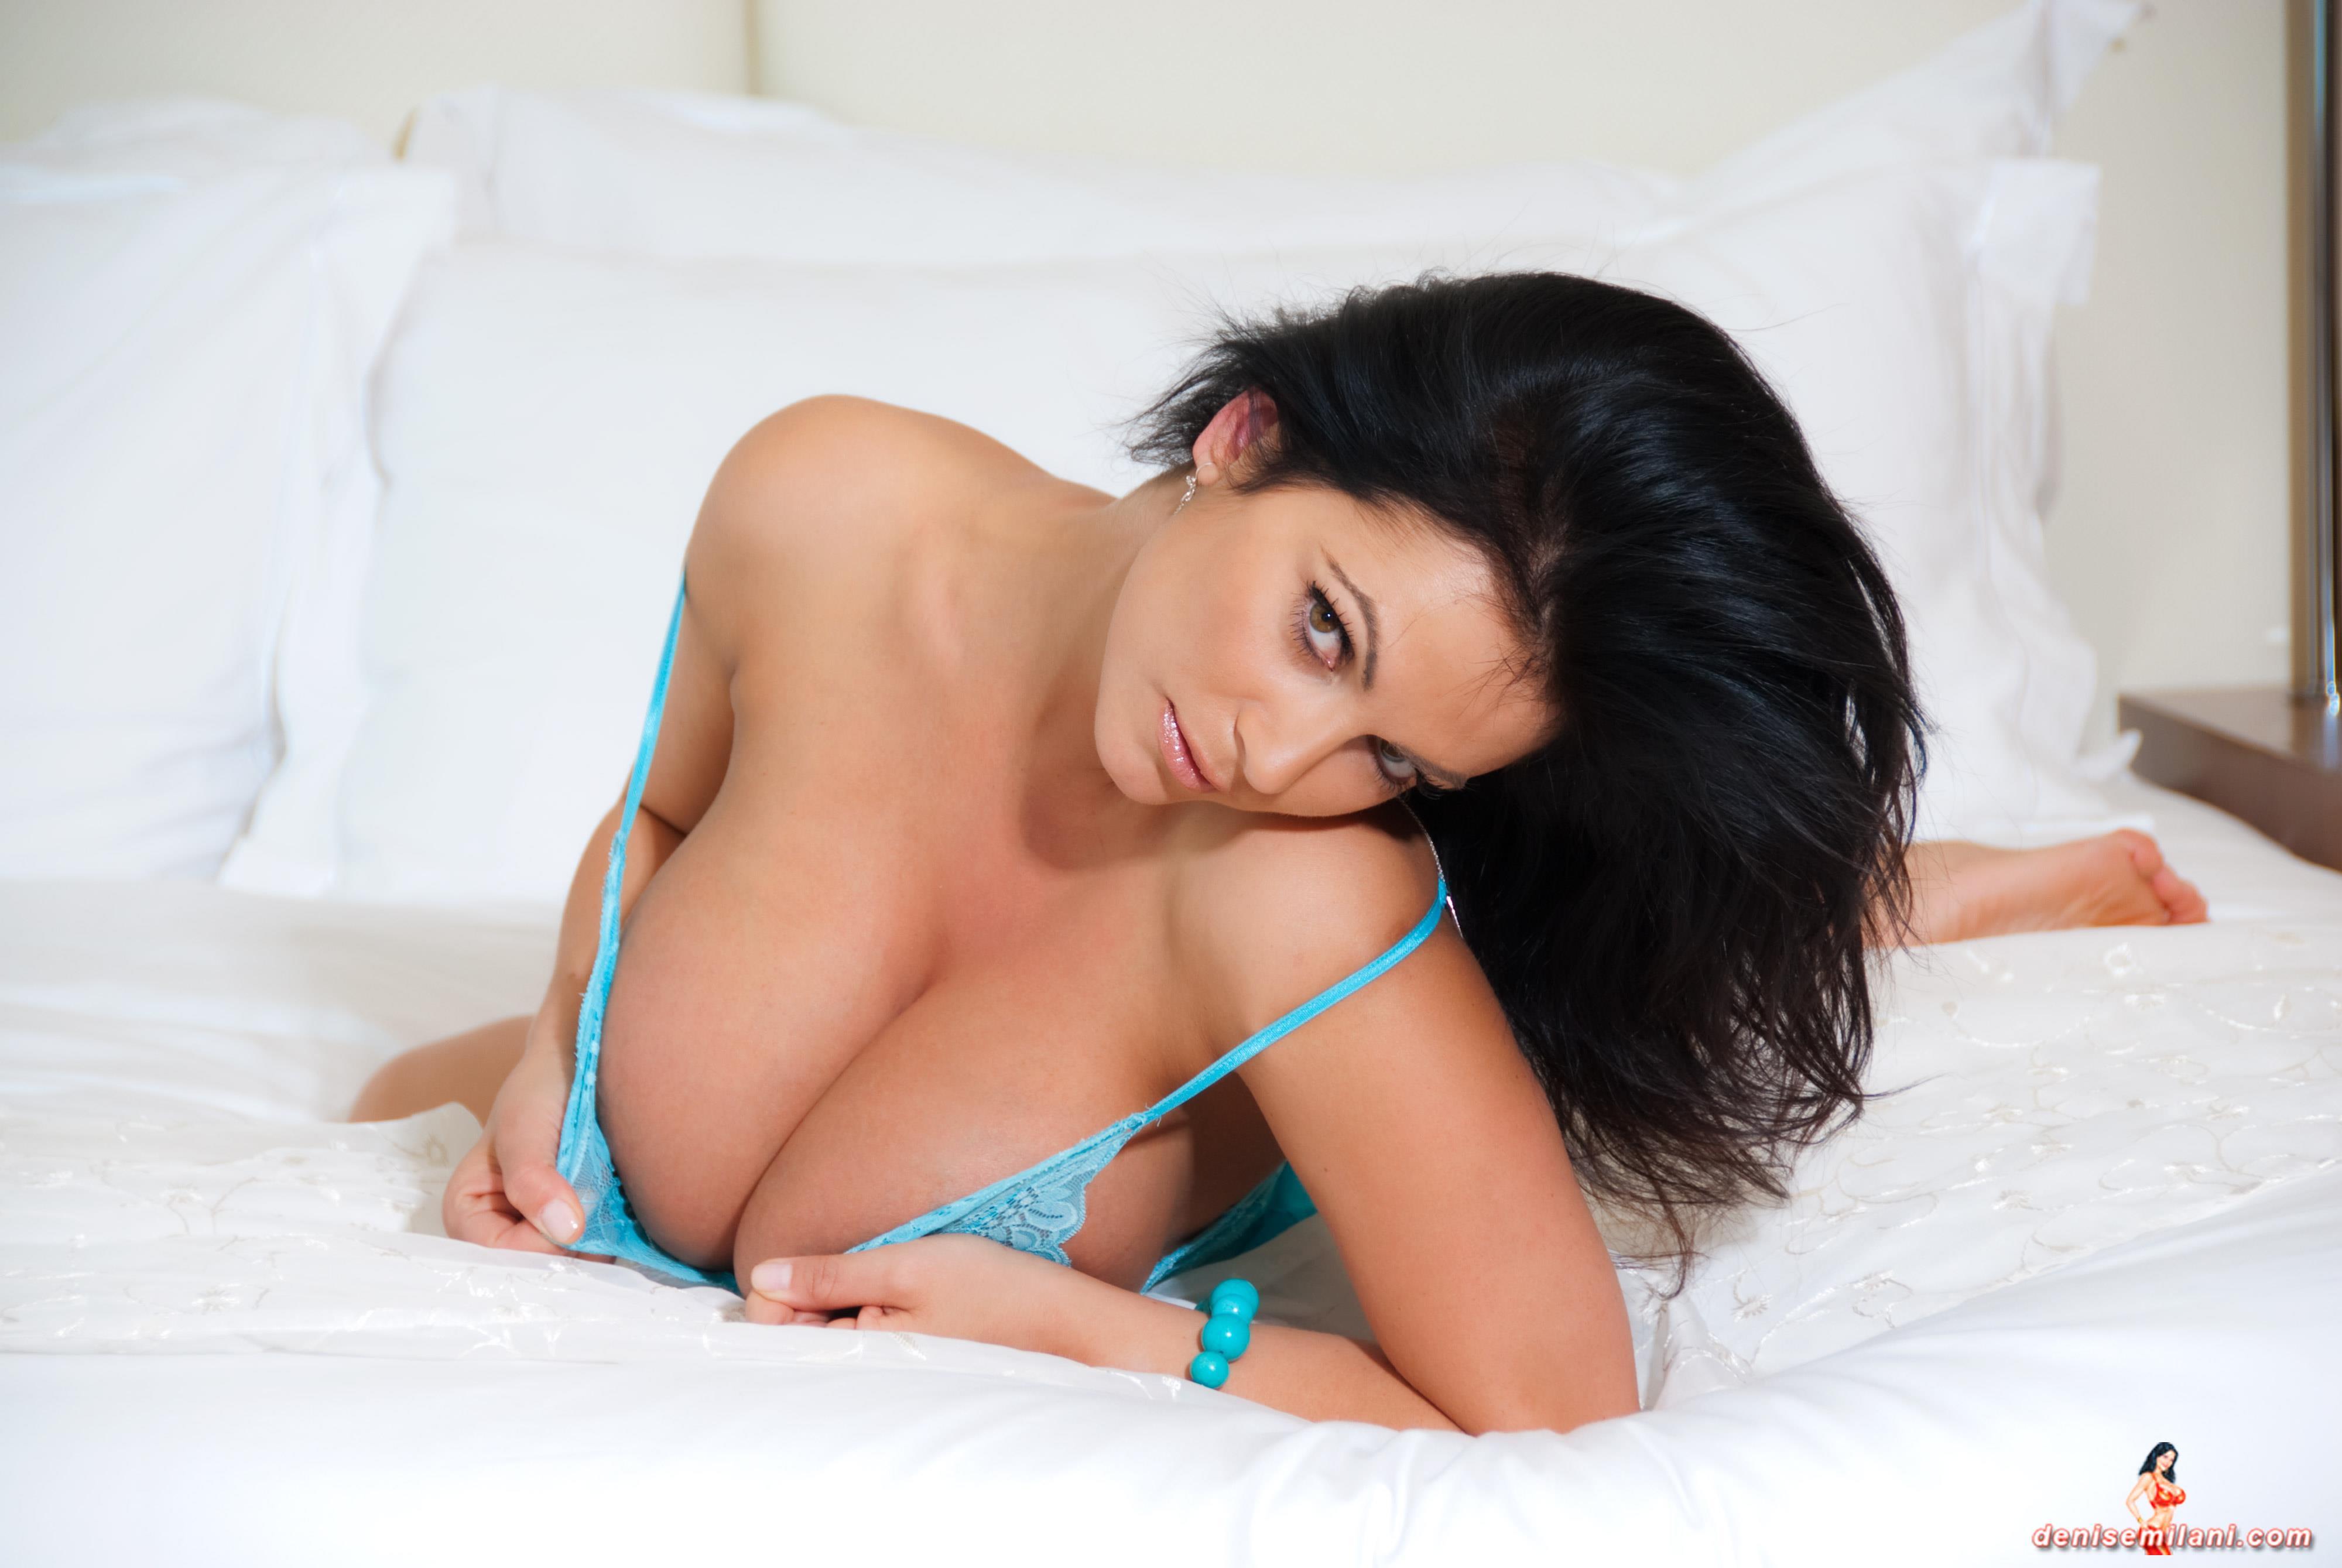 Фото порно денис милани, Denise Milani - все порно и секс фото модели 21 фотография